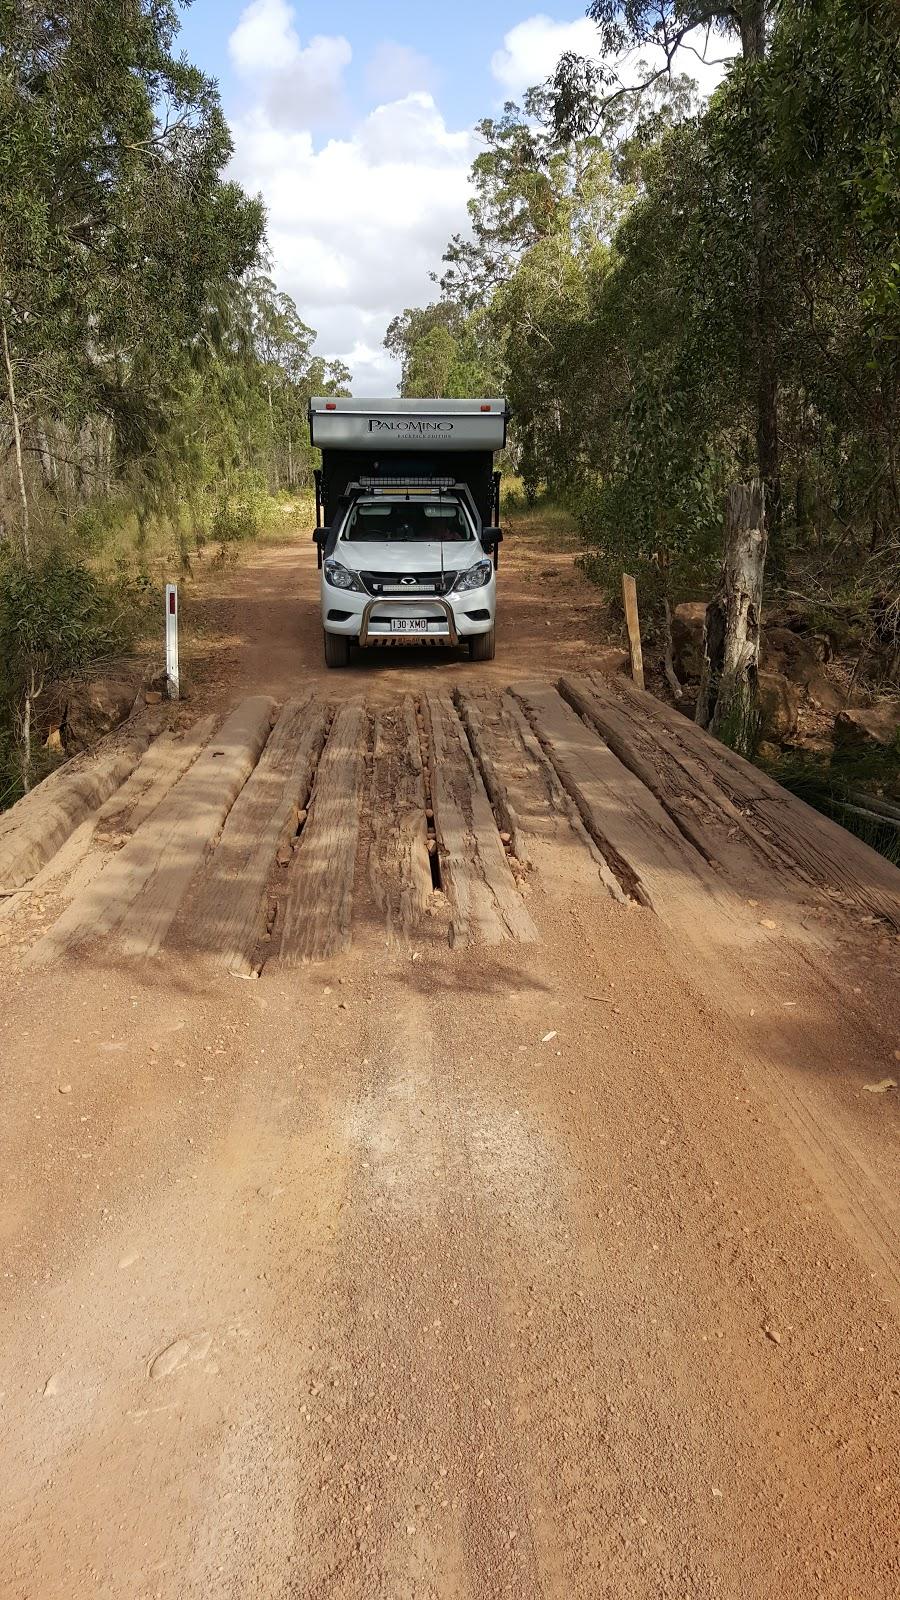 Wongi Waterholes Camping Area | campground | Duckinwilla QLD 4650, Australia